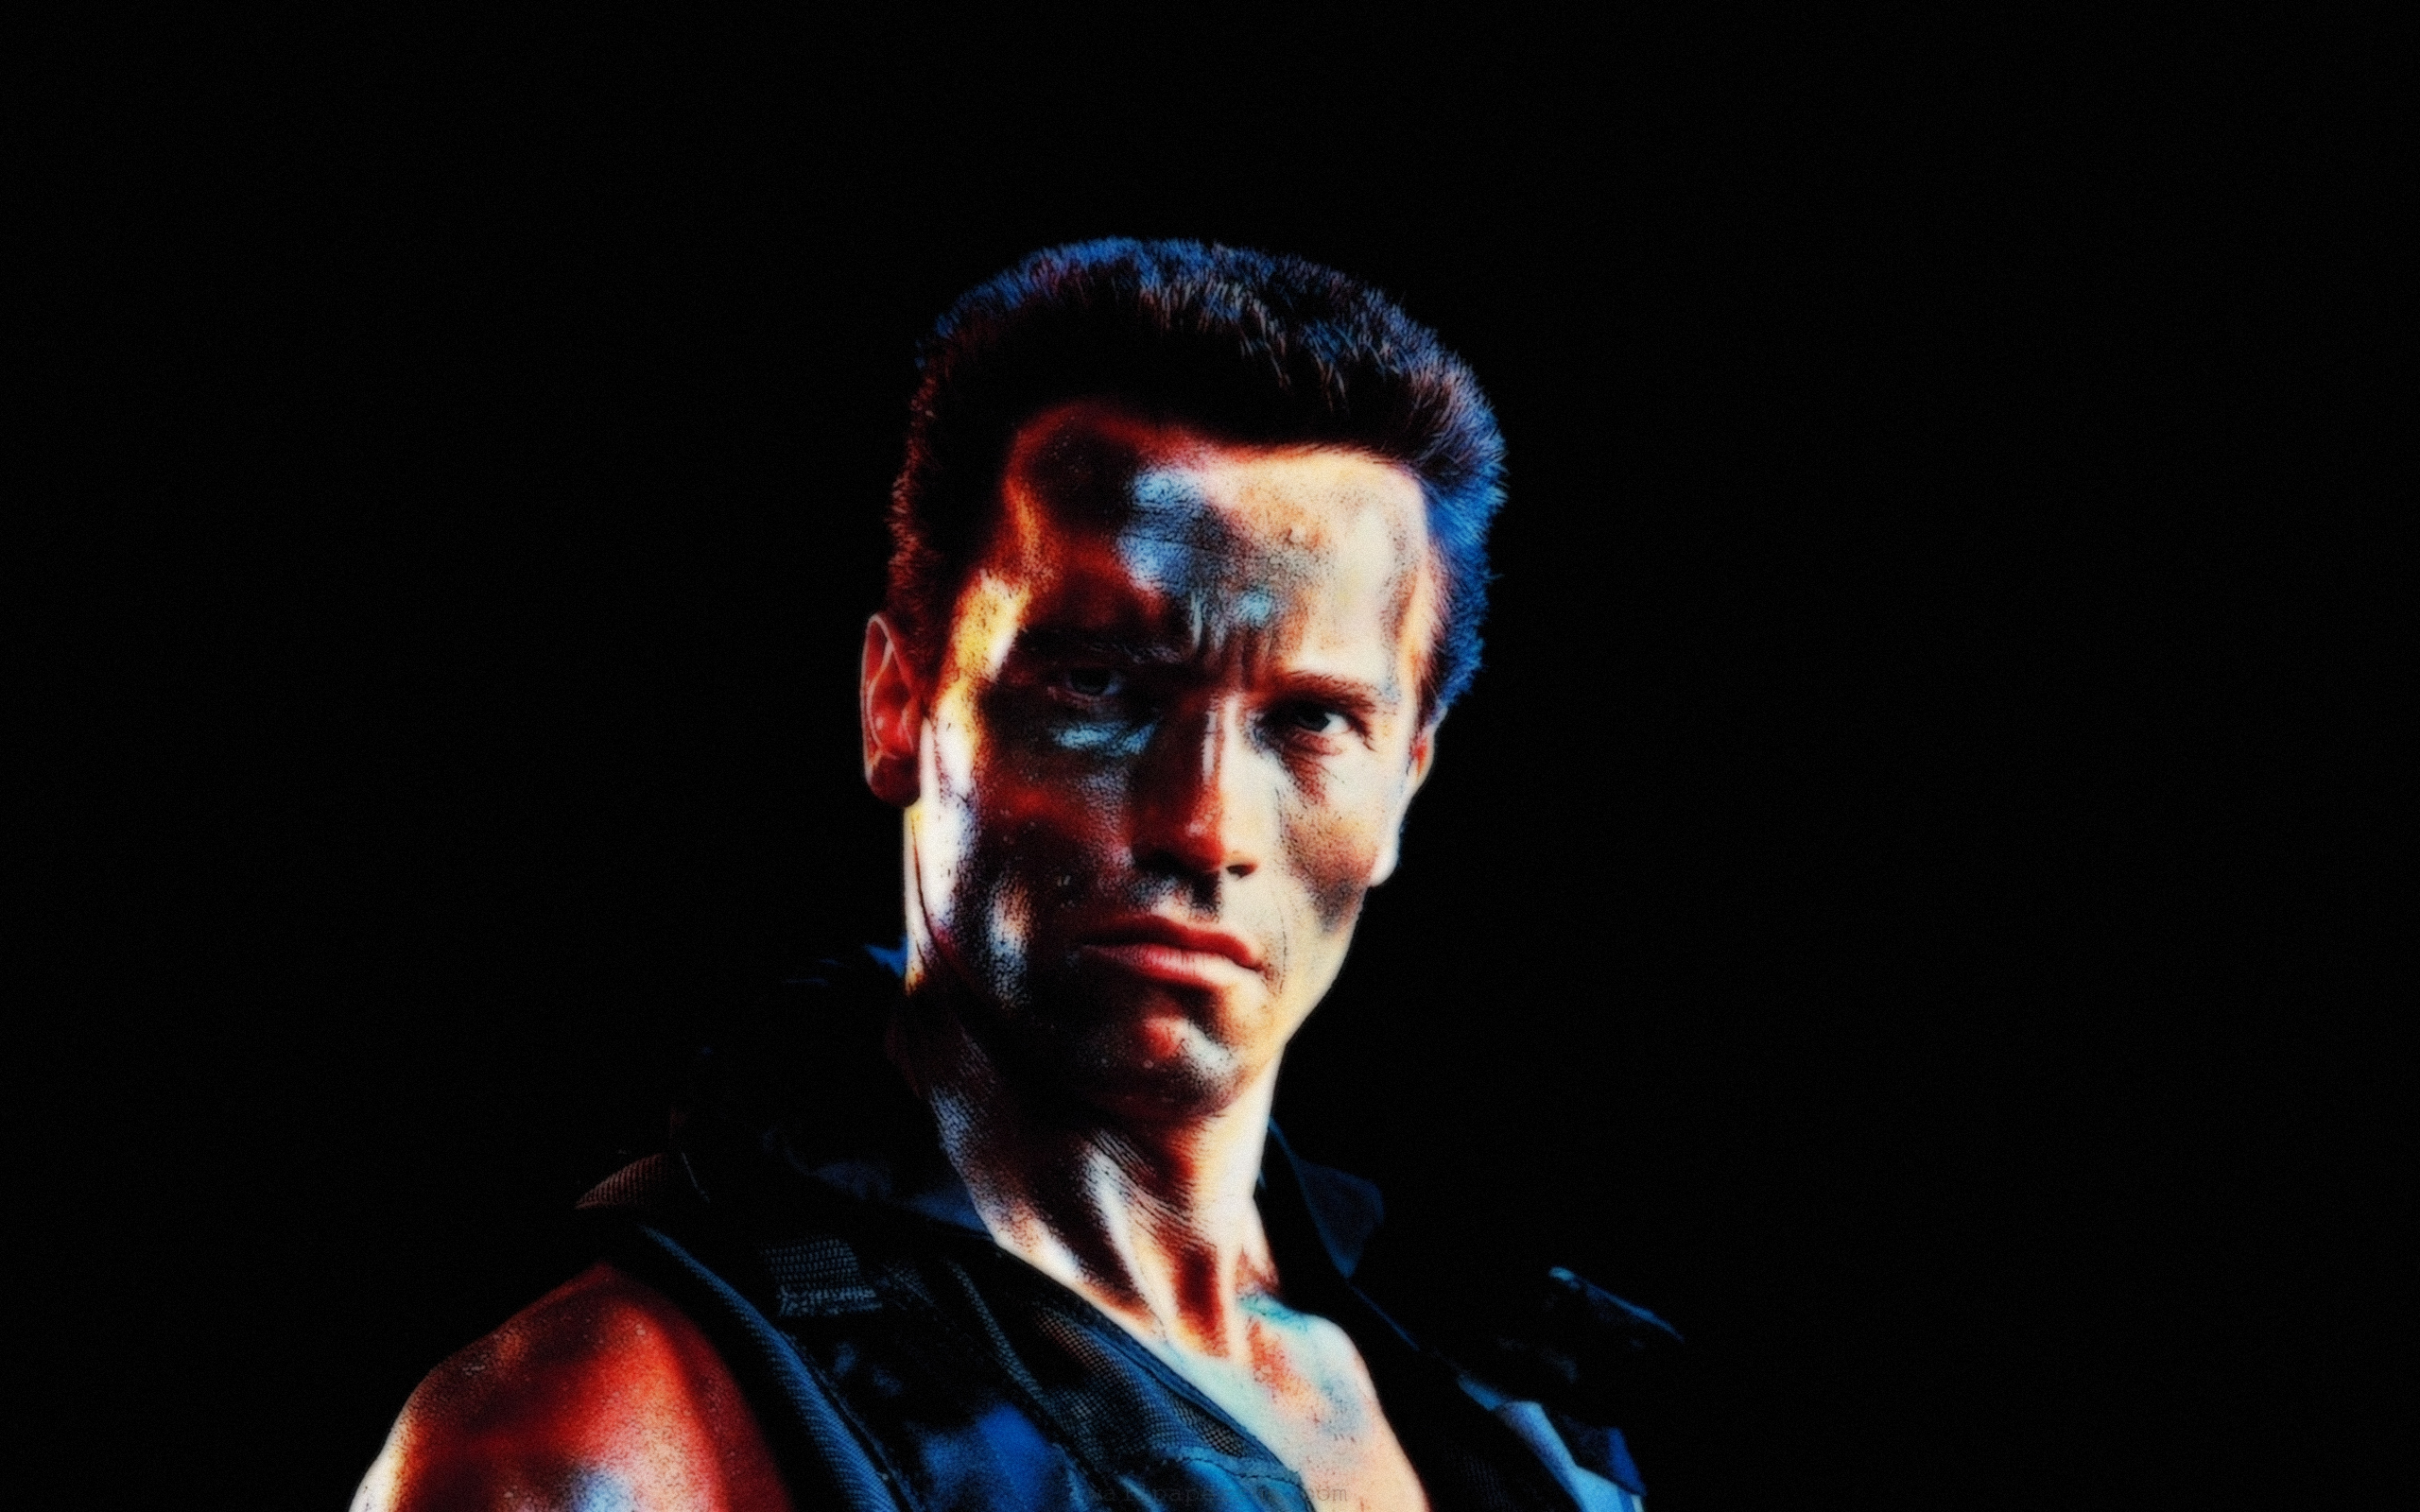 Arnold Schwarzenegger High Quality Wallpapers